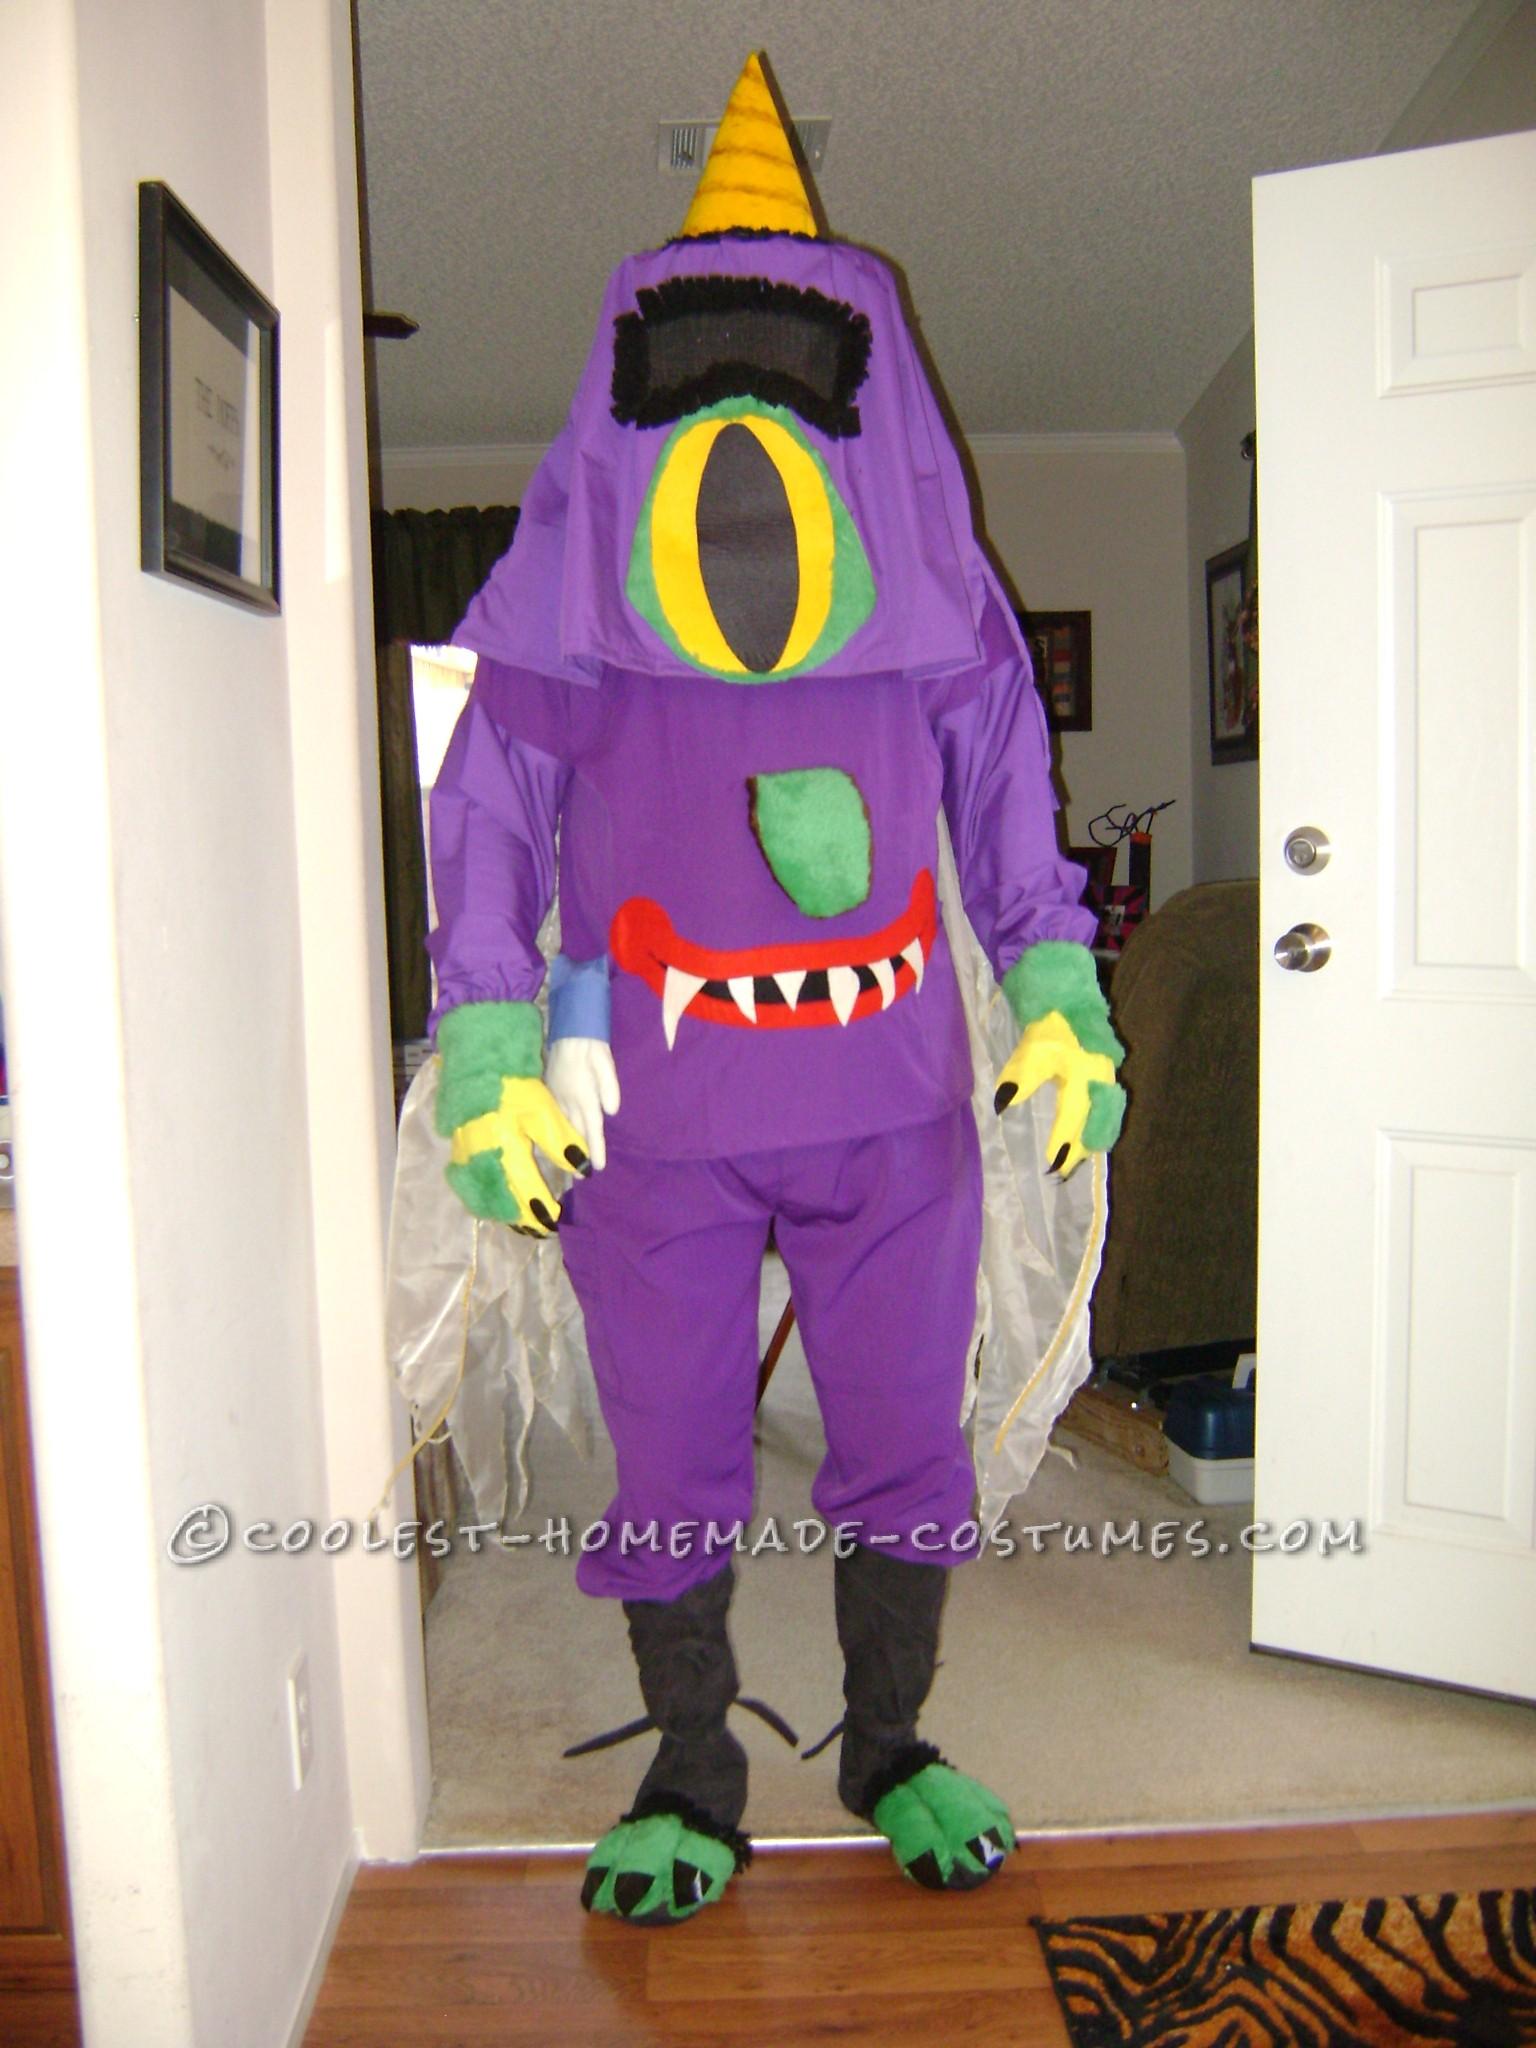 Funny DIY Halloween Costume Idea: Nightmarish Purple People Eater on the Prowl